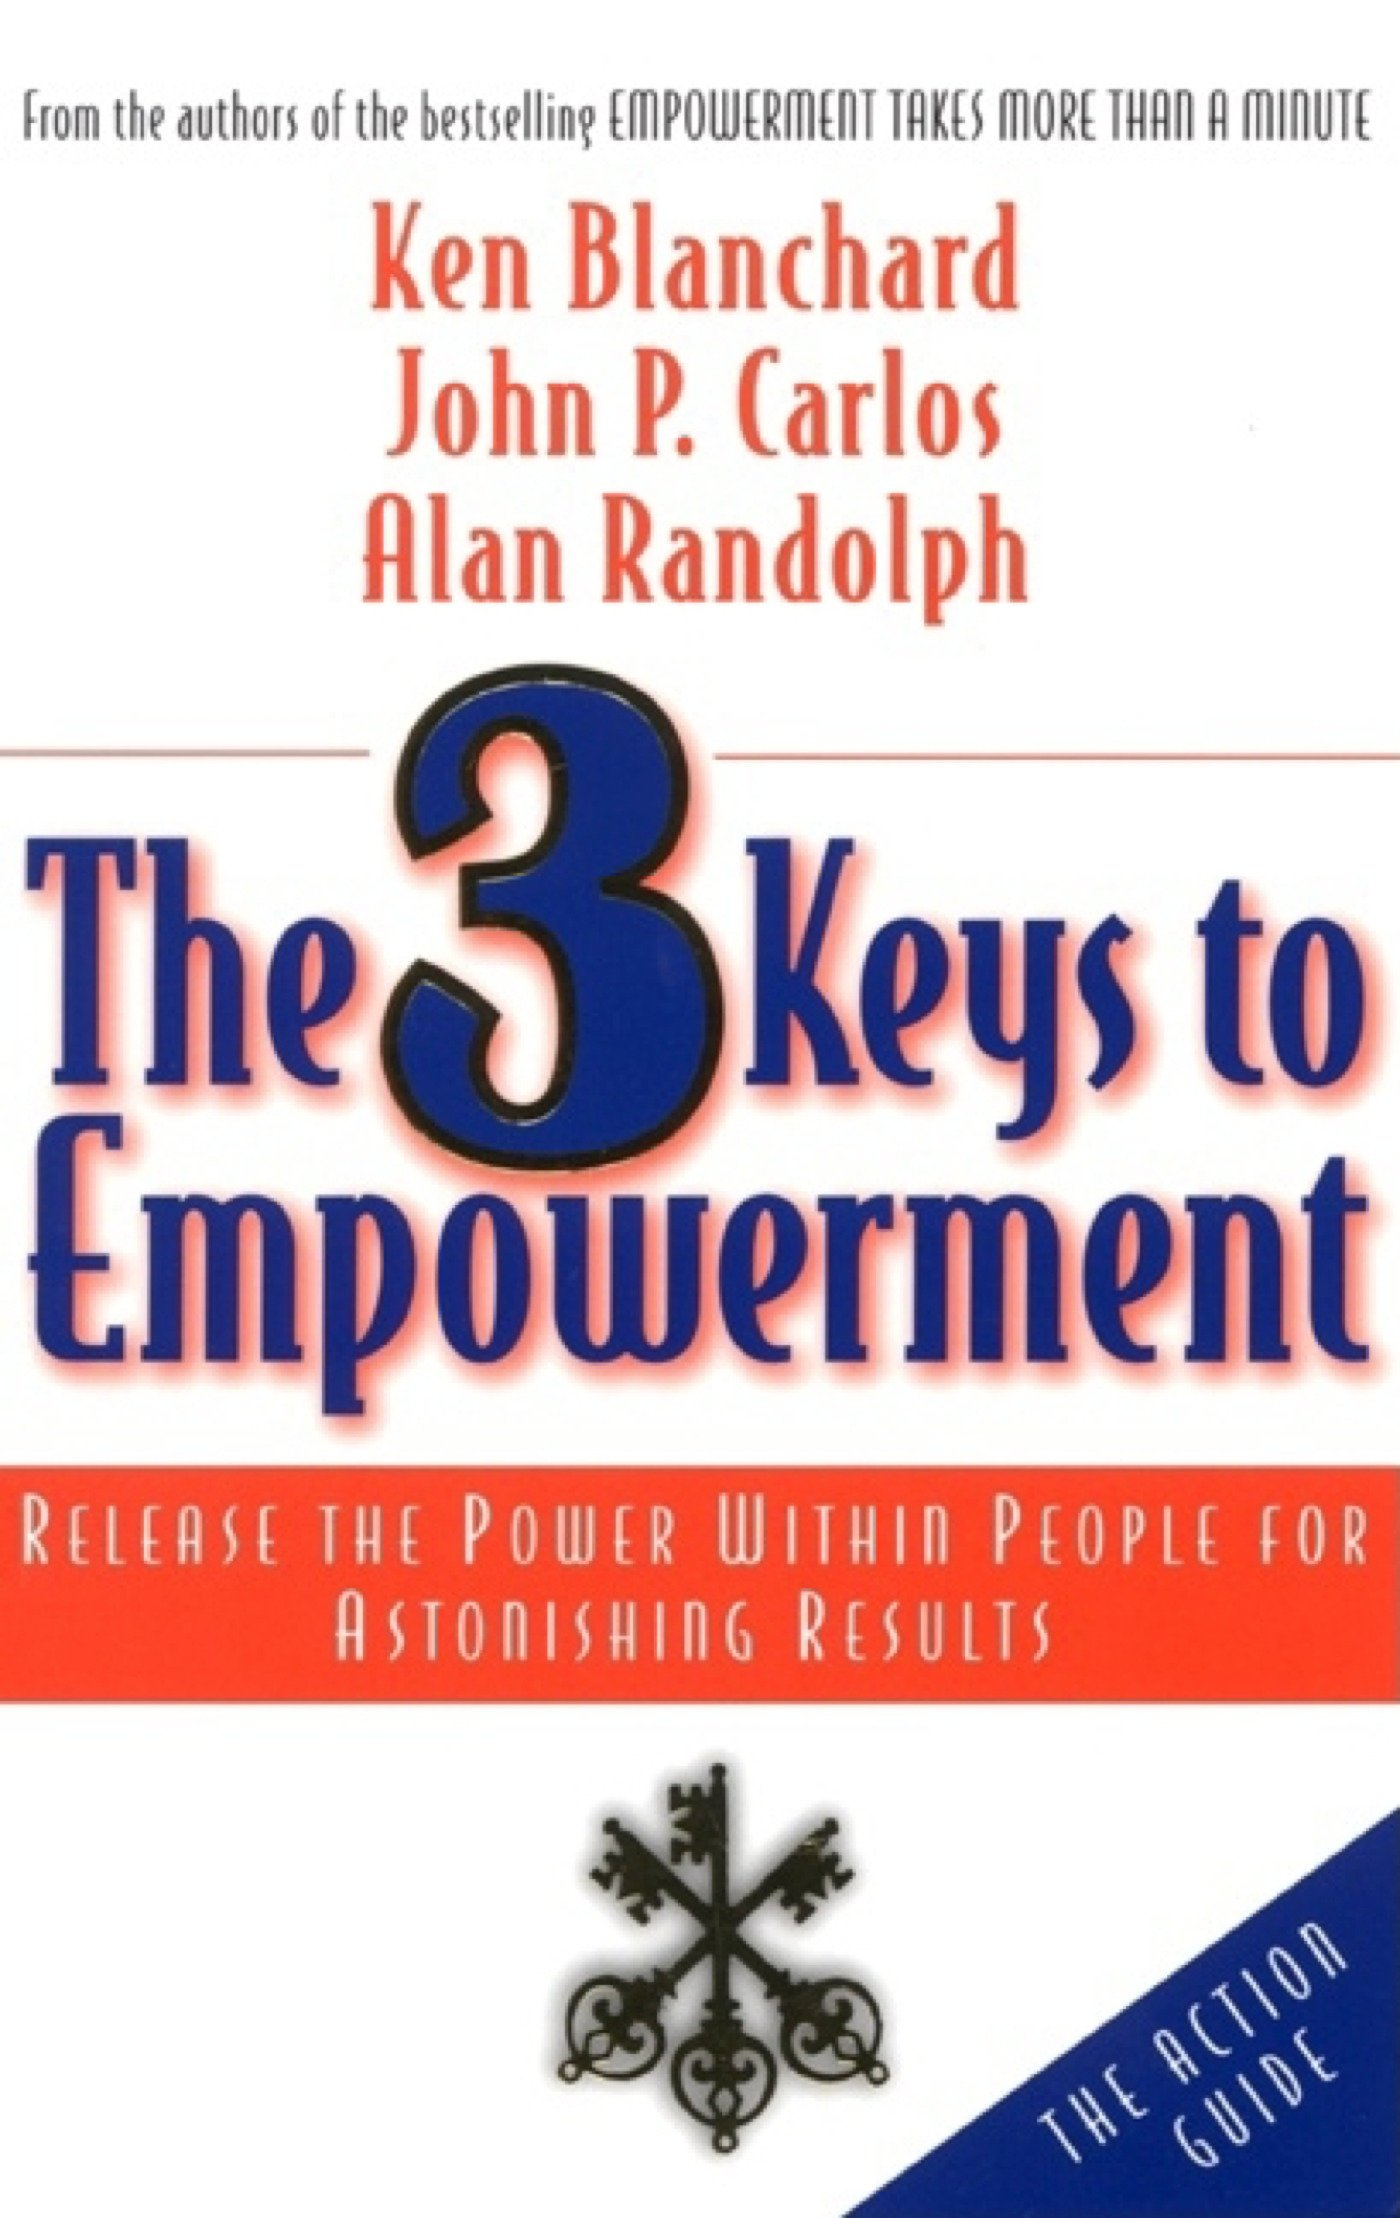 The 3 keys to empowerment release the power within people for the 3 keys to empowerment release the power within people for astonishing results ken blanchard john p carlos alan randolph 9781576751602 amazon fandeluxe Images